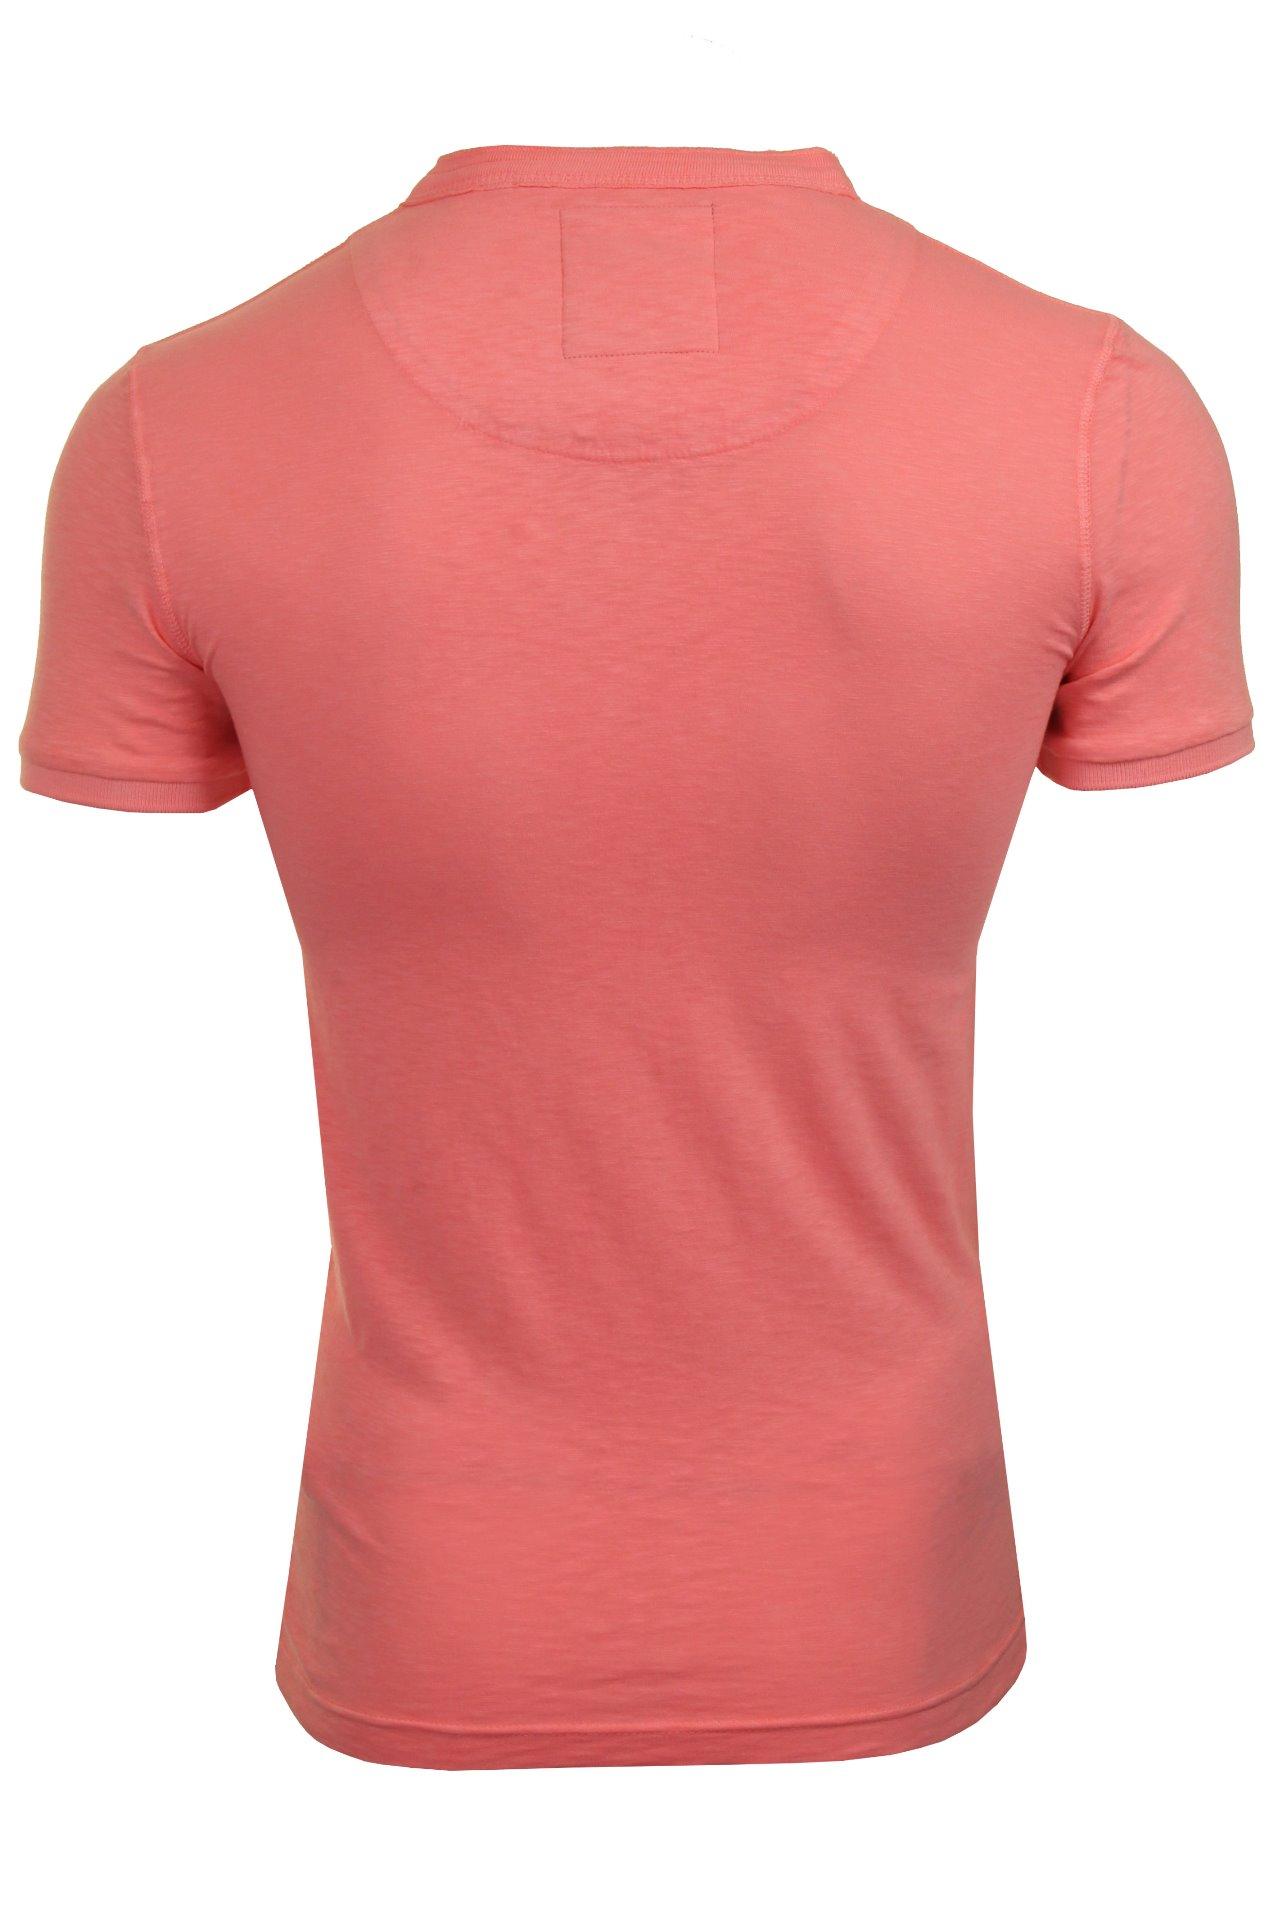 Camisa-de-manga-corta-039-Homestead-039-Abuelo-T-Shirt miniatura 11